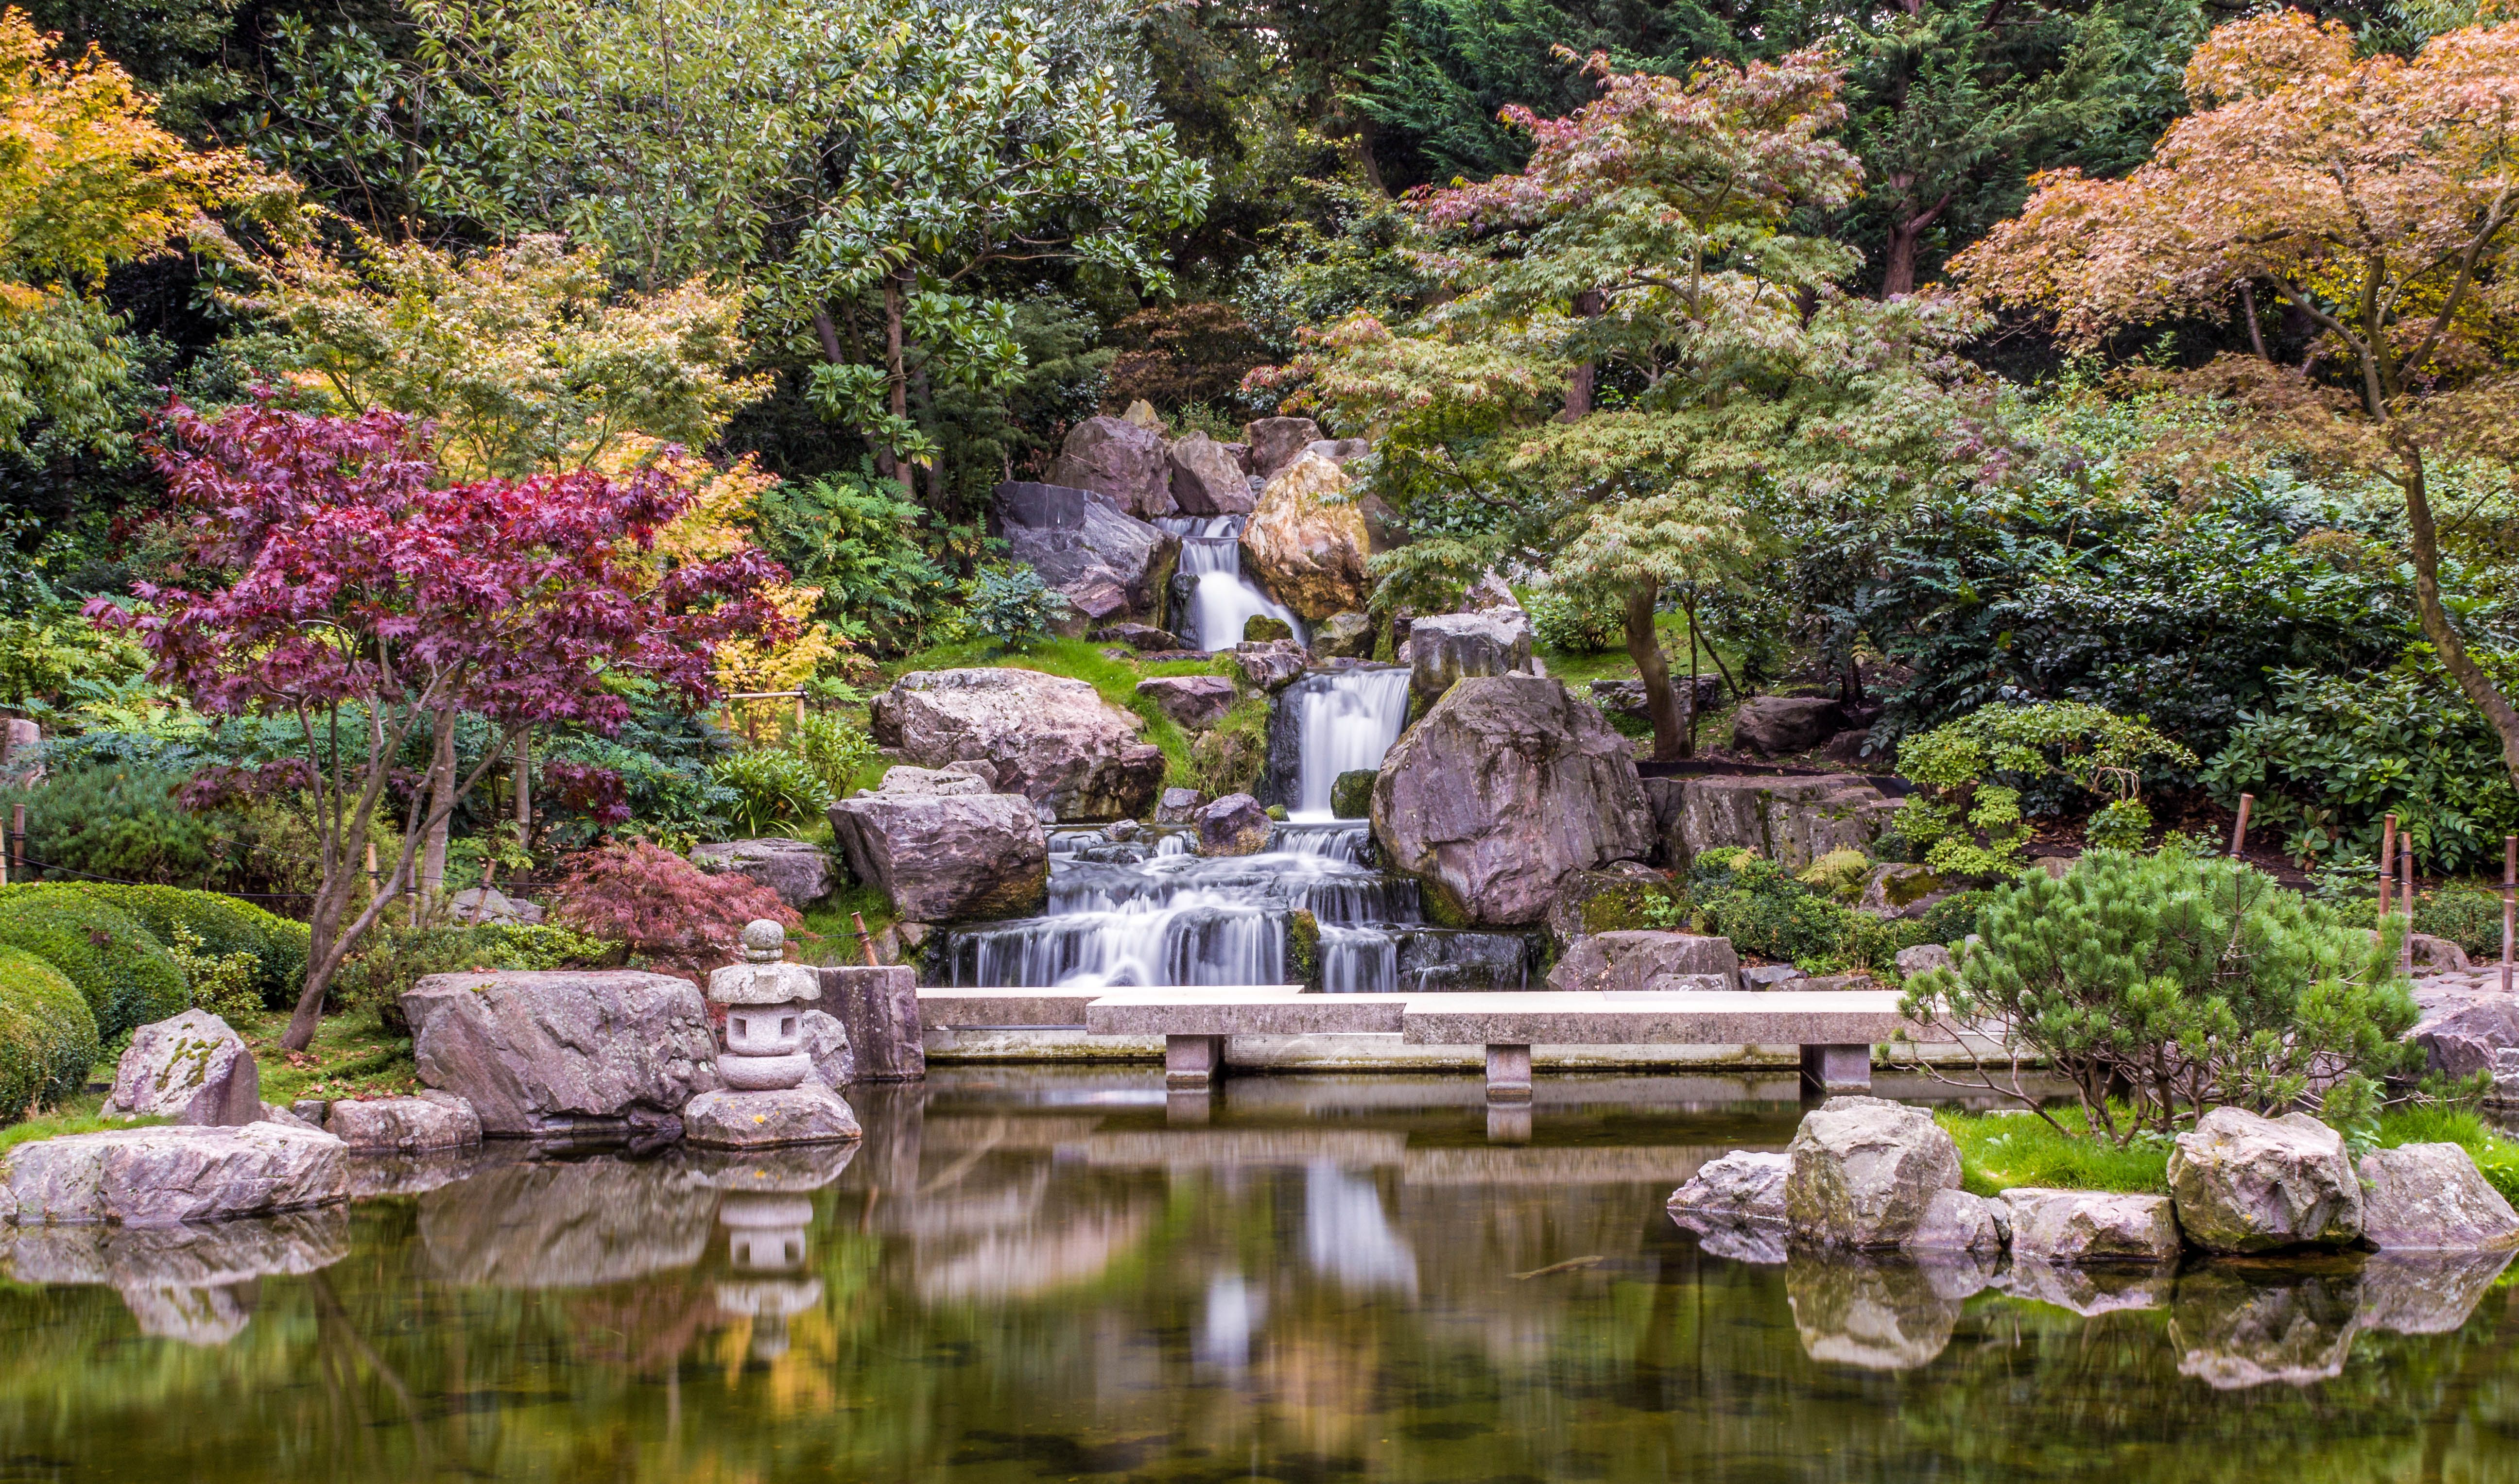 kyoto garden @ holland park (kensington) — free | london